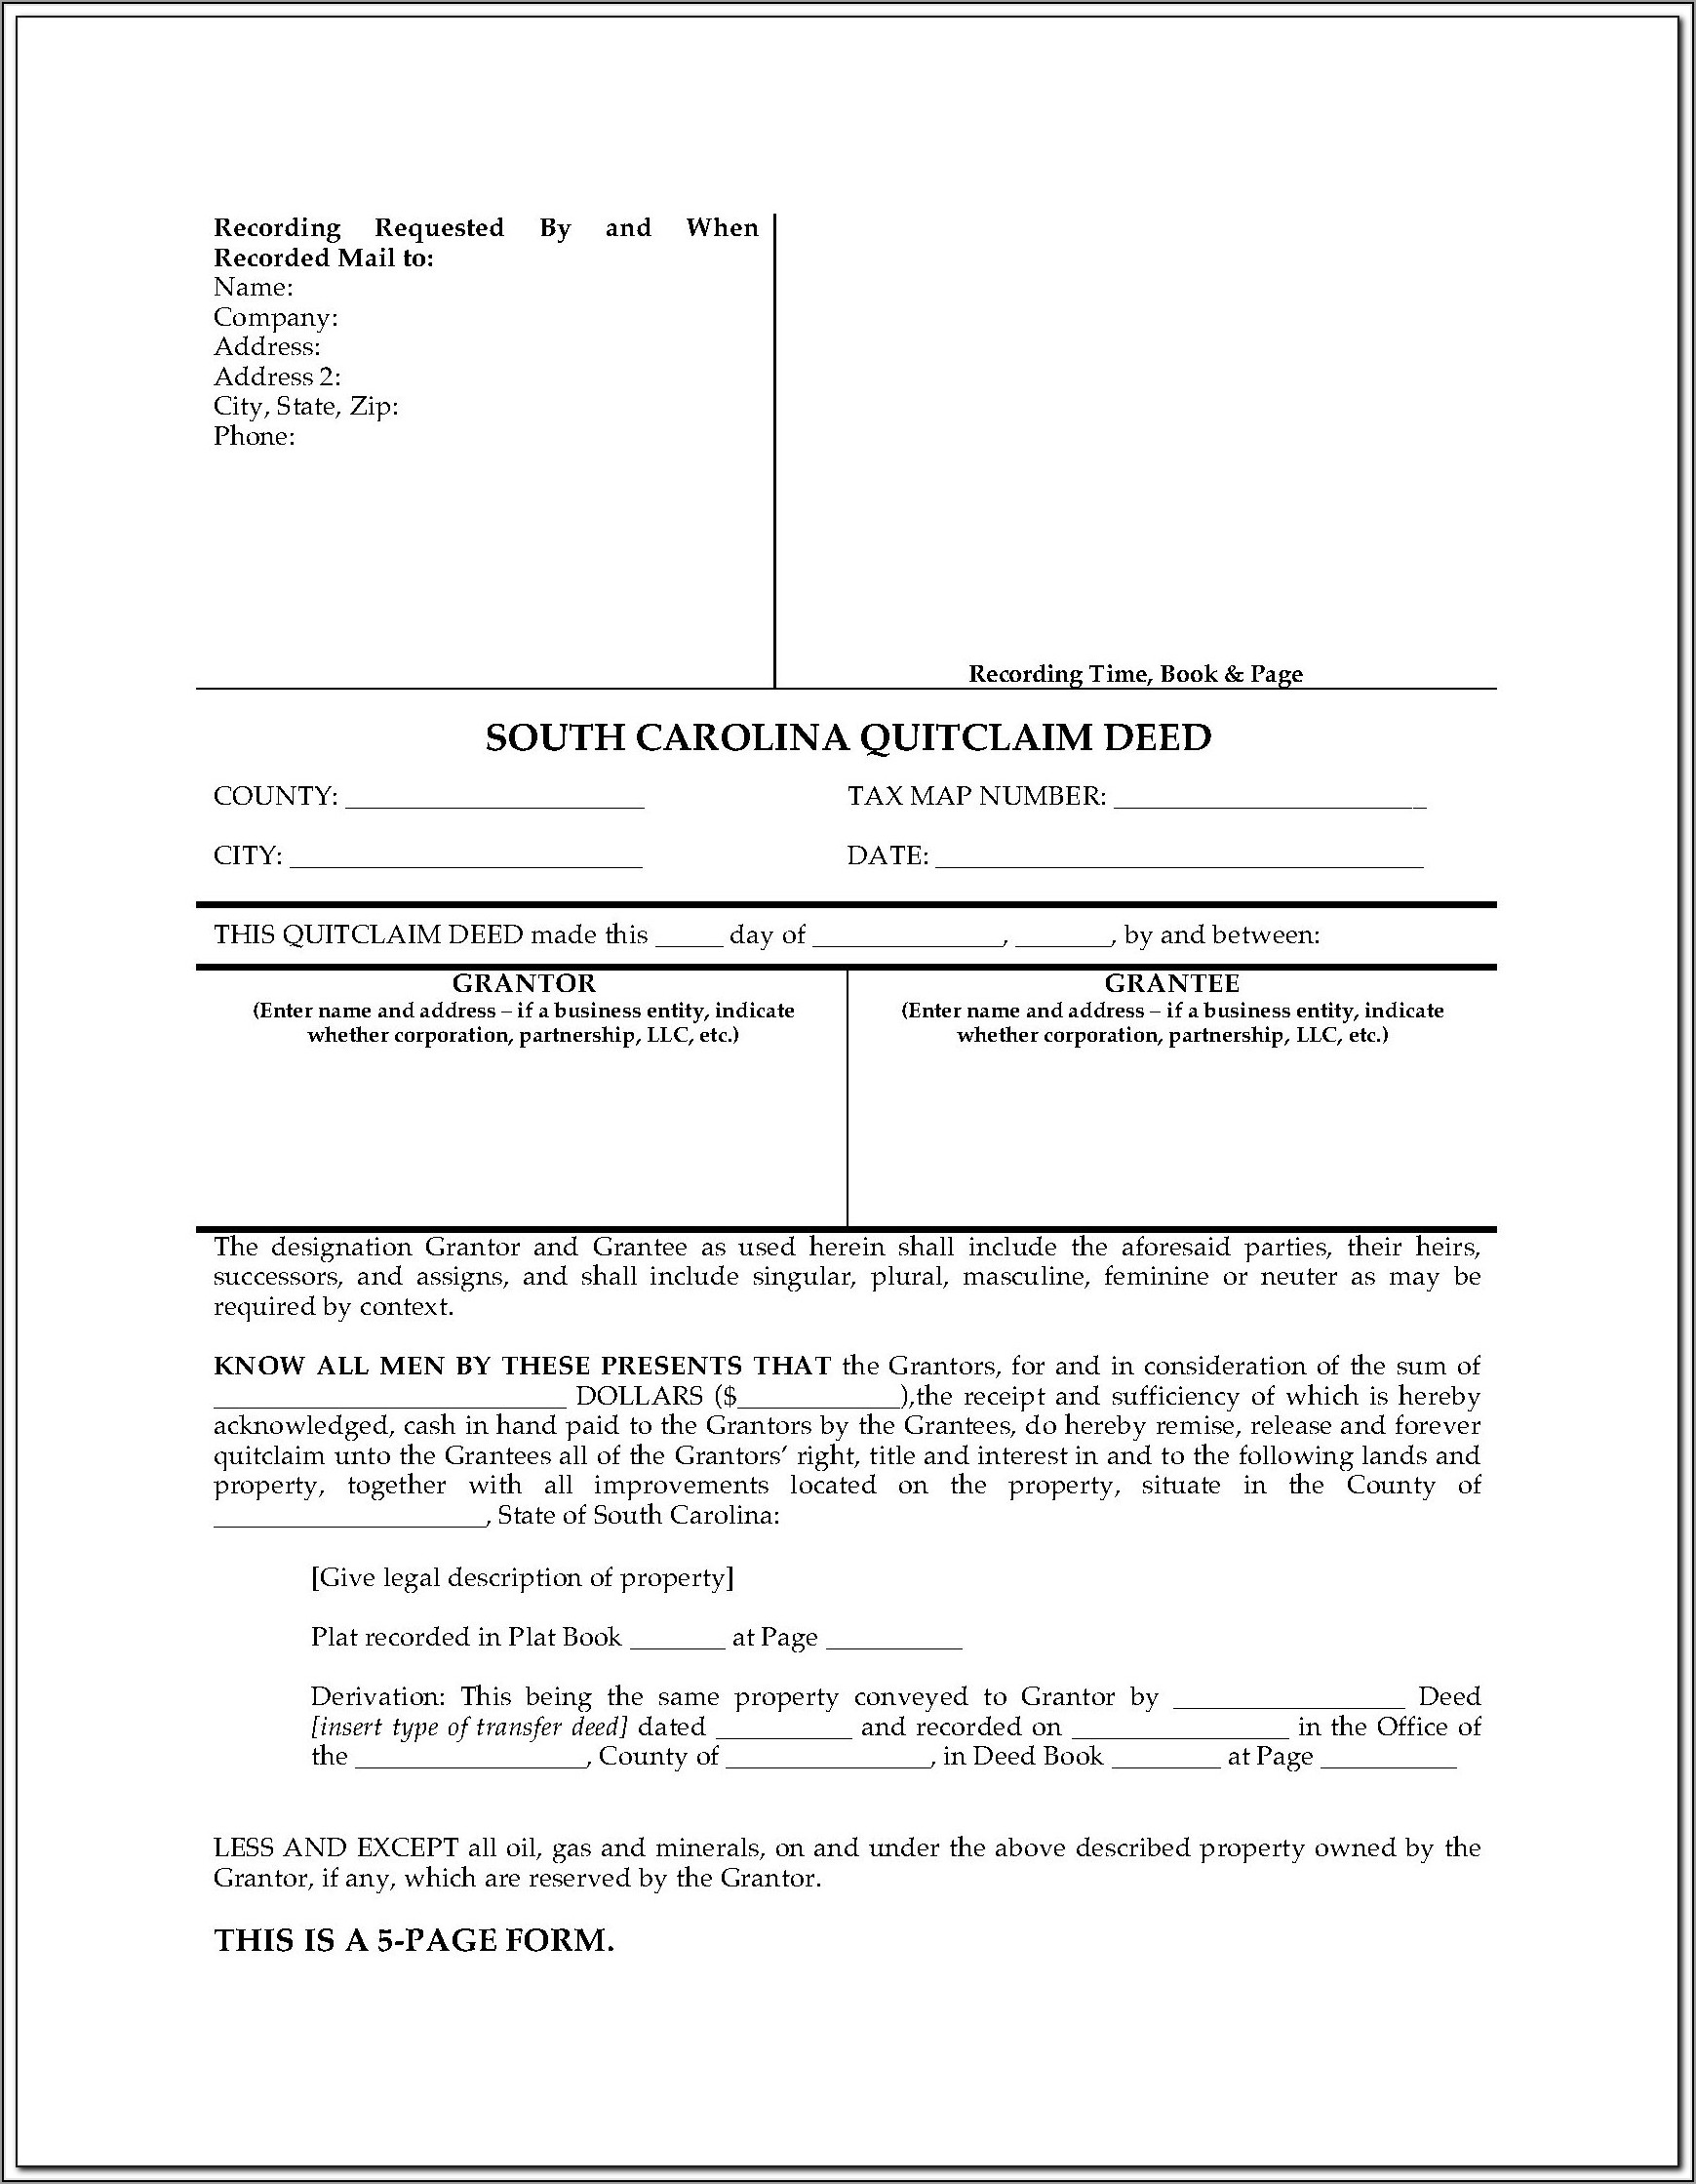 South Carolina Quitclaim Deed Form